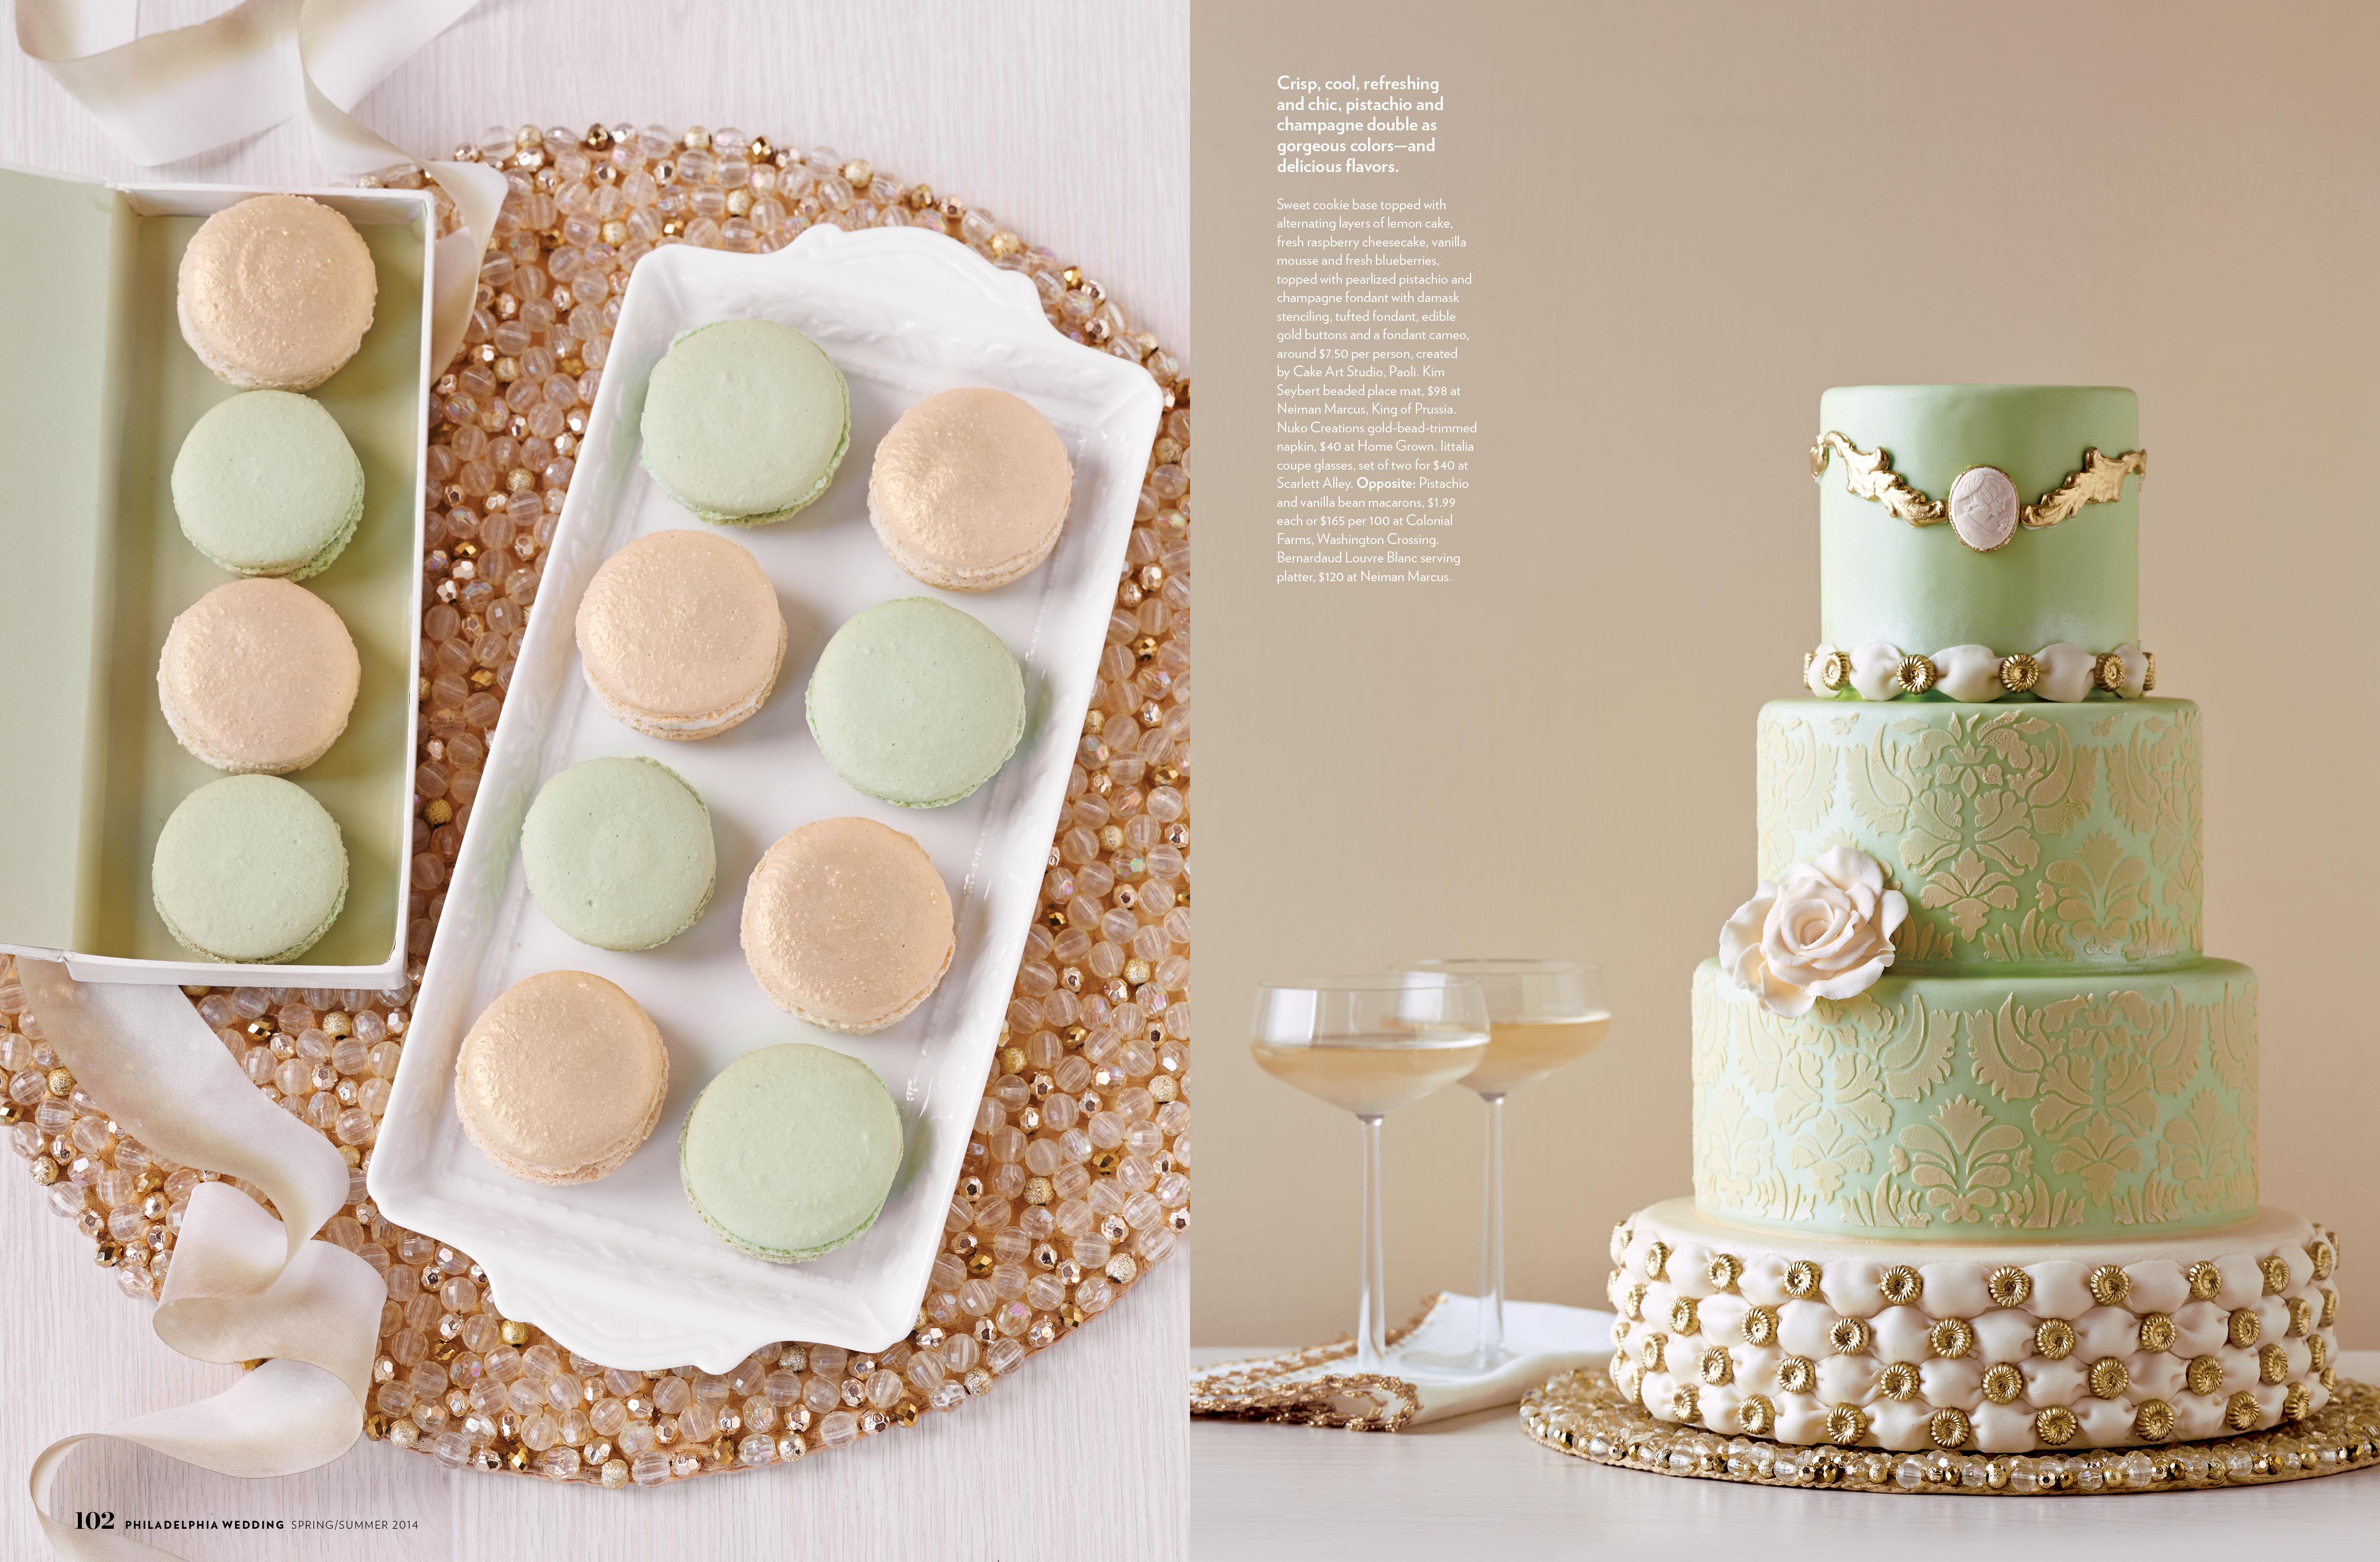 Philadelphia Wedding Cake Feature Alyse Moyer Graphic Design